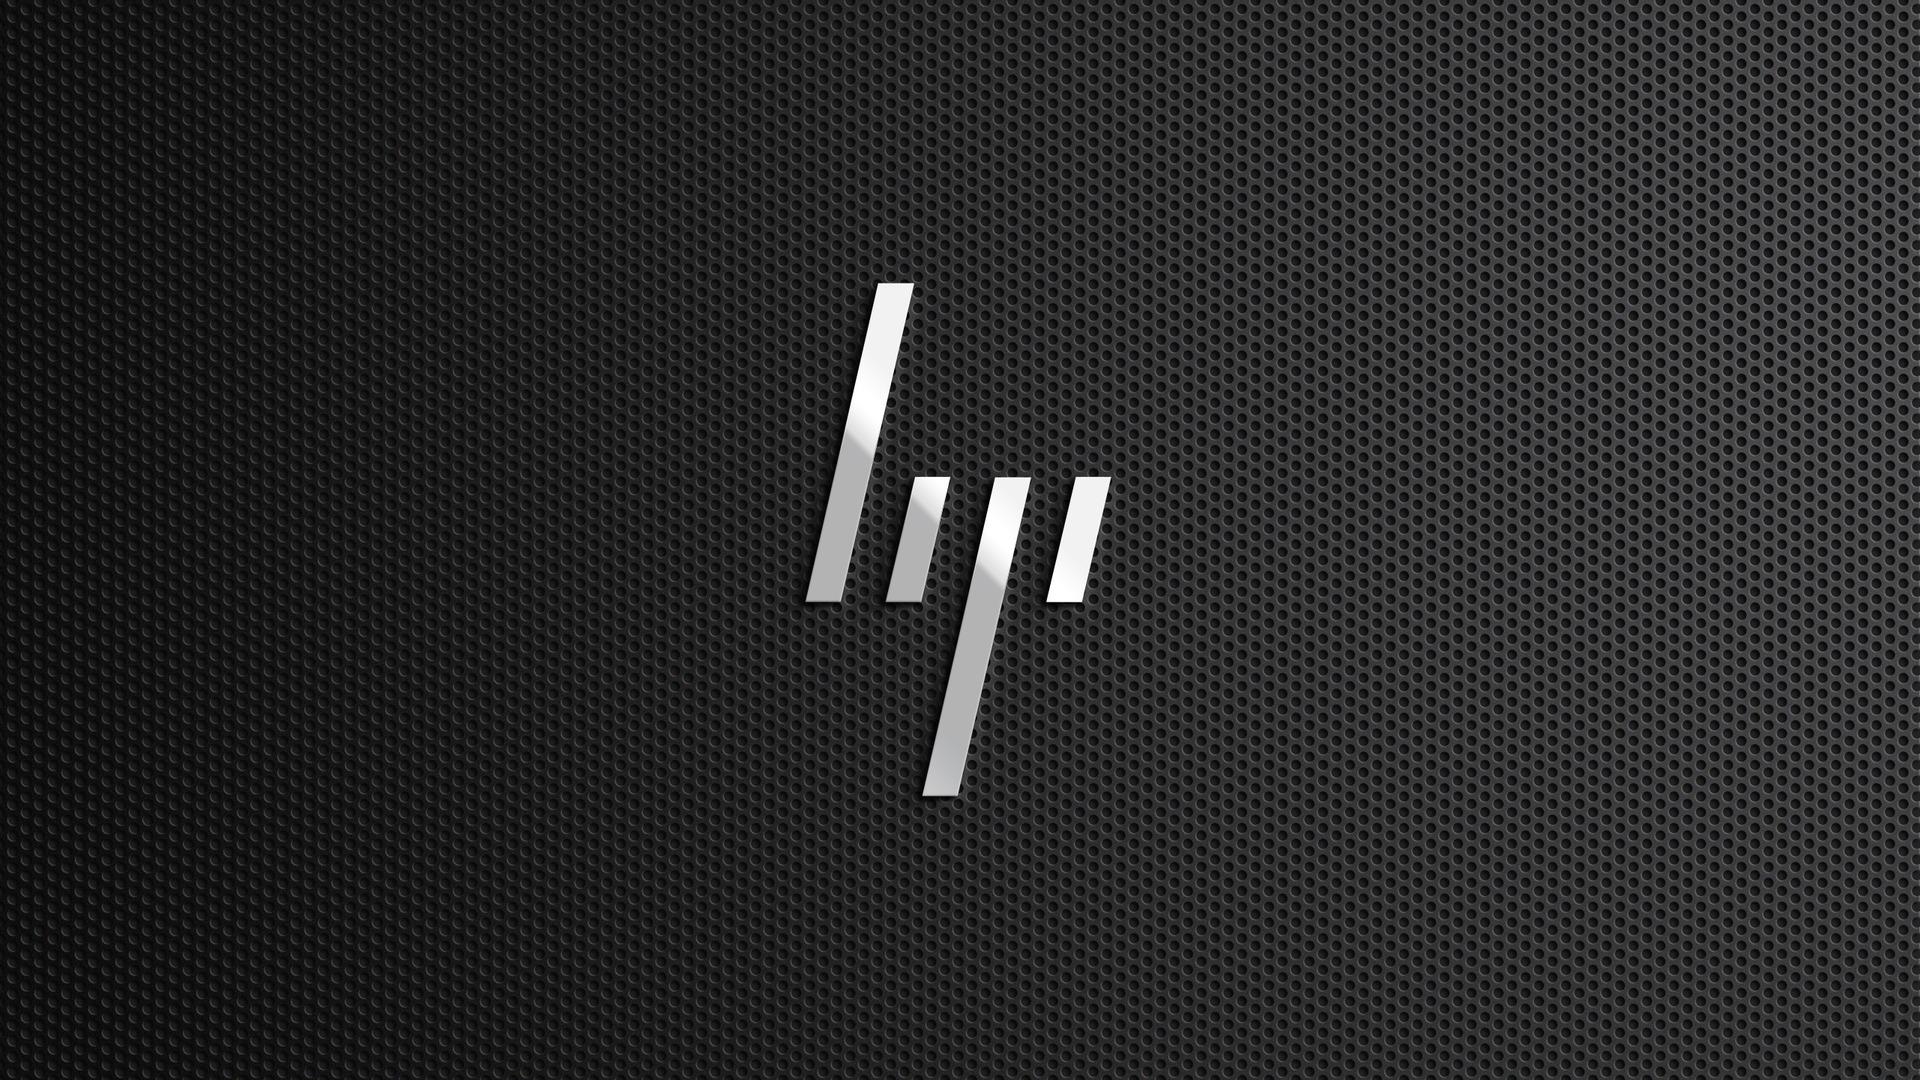 download Hp Original Backgrounds HD Wallpapers [1920x1080 1920x1080